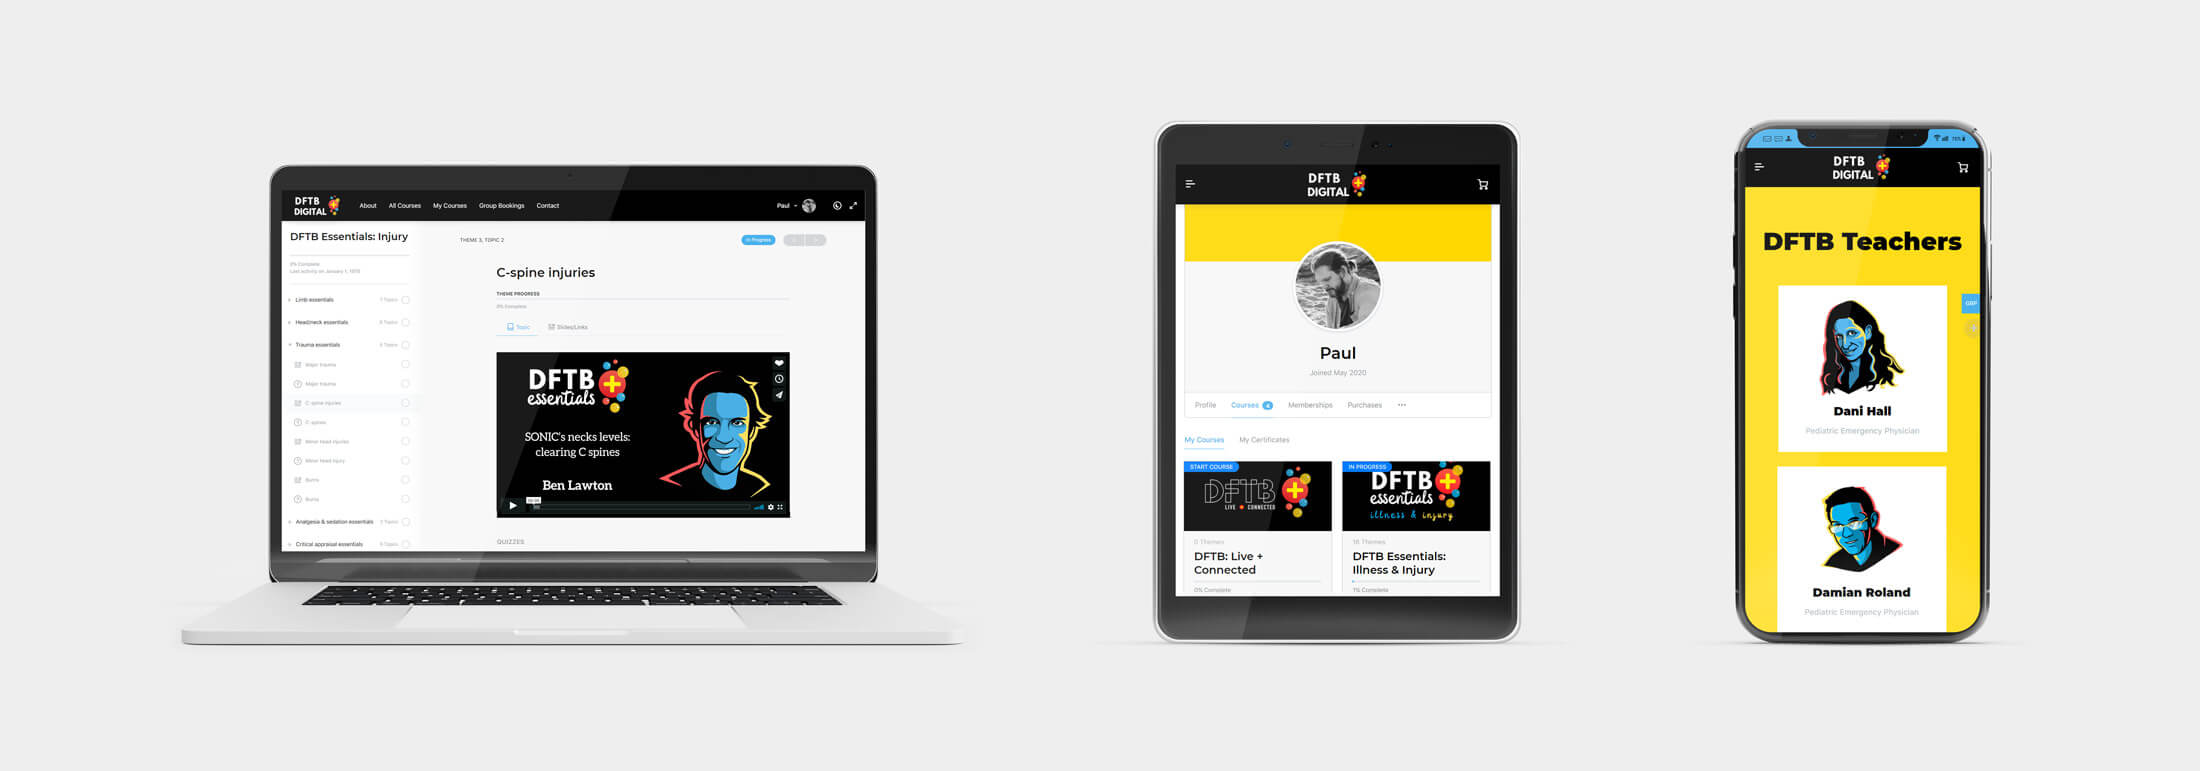 DFTB Digital Responsive Web Design - Laptop and Mobile Device Views